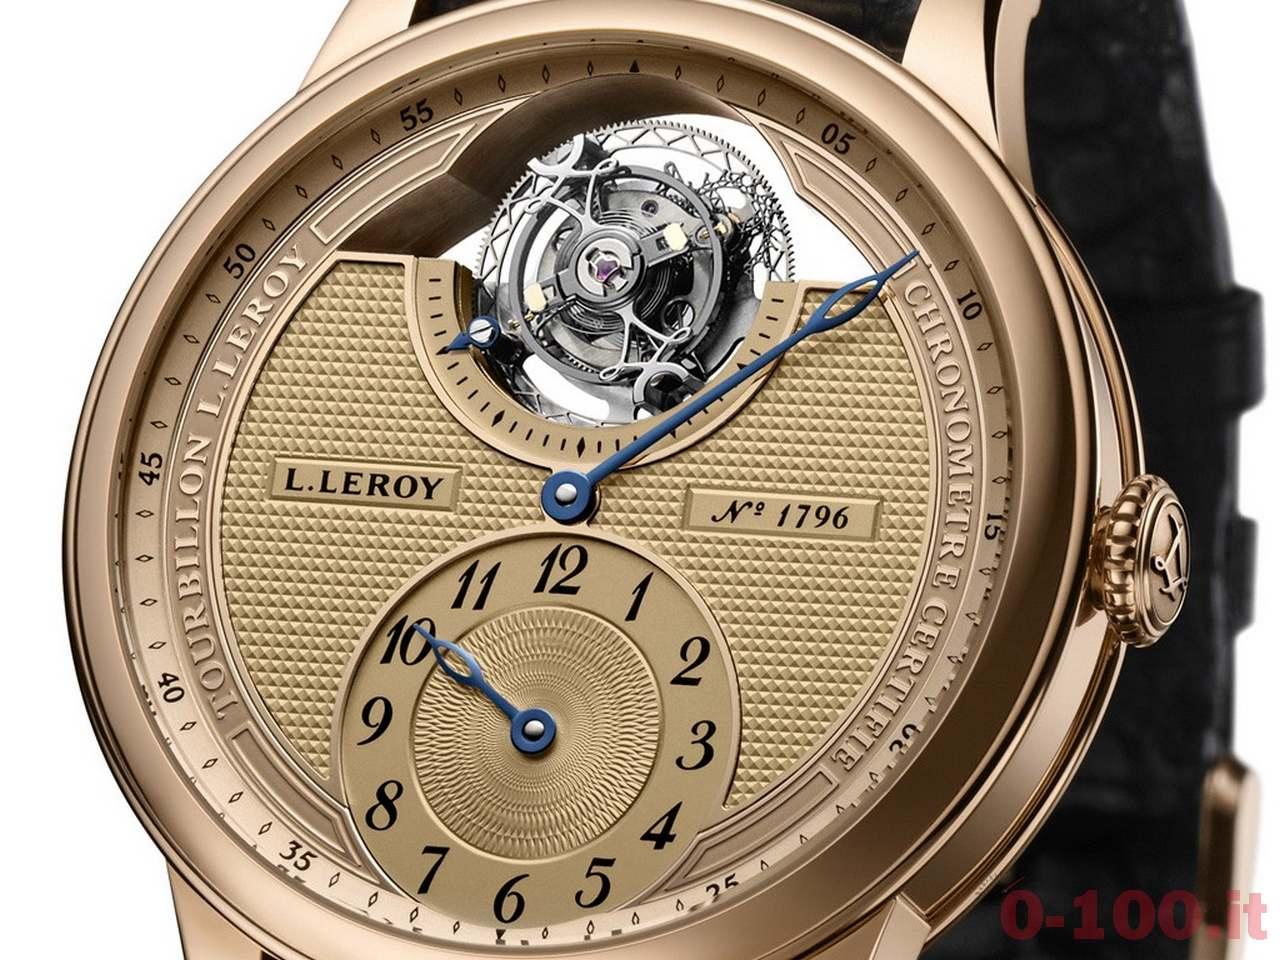 l-leroy-tourbillon-regulateur-osmior-oro-rosa-prezzo-price_0-1003